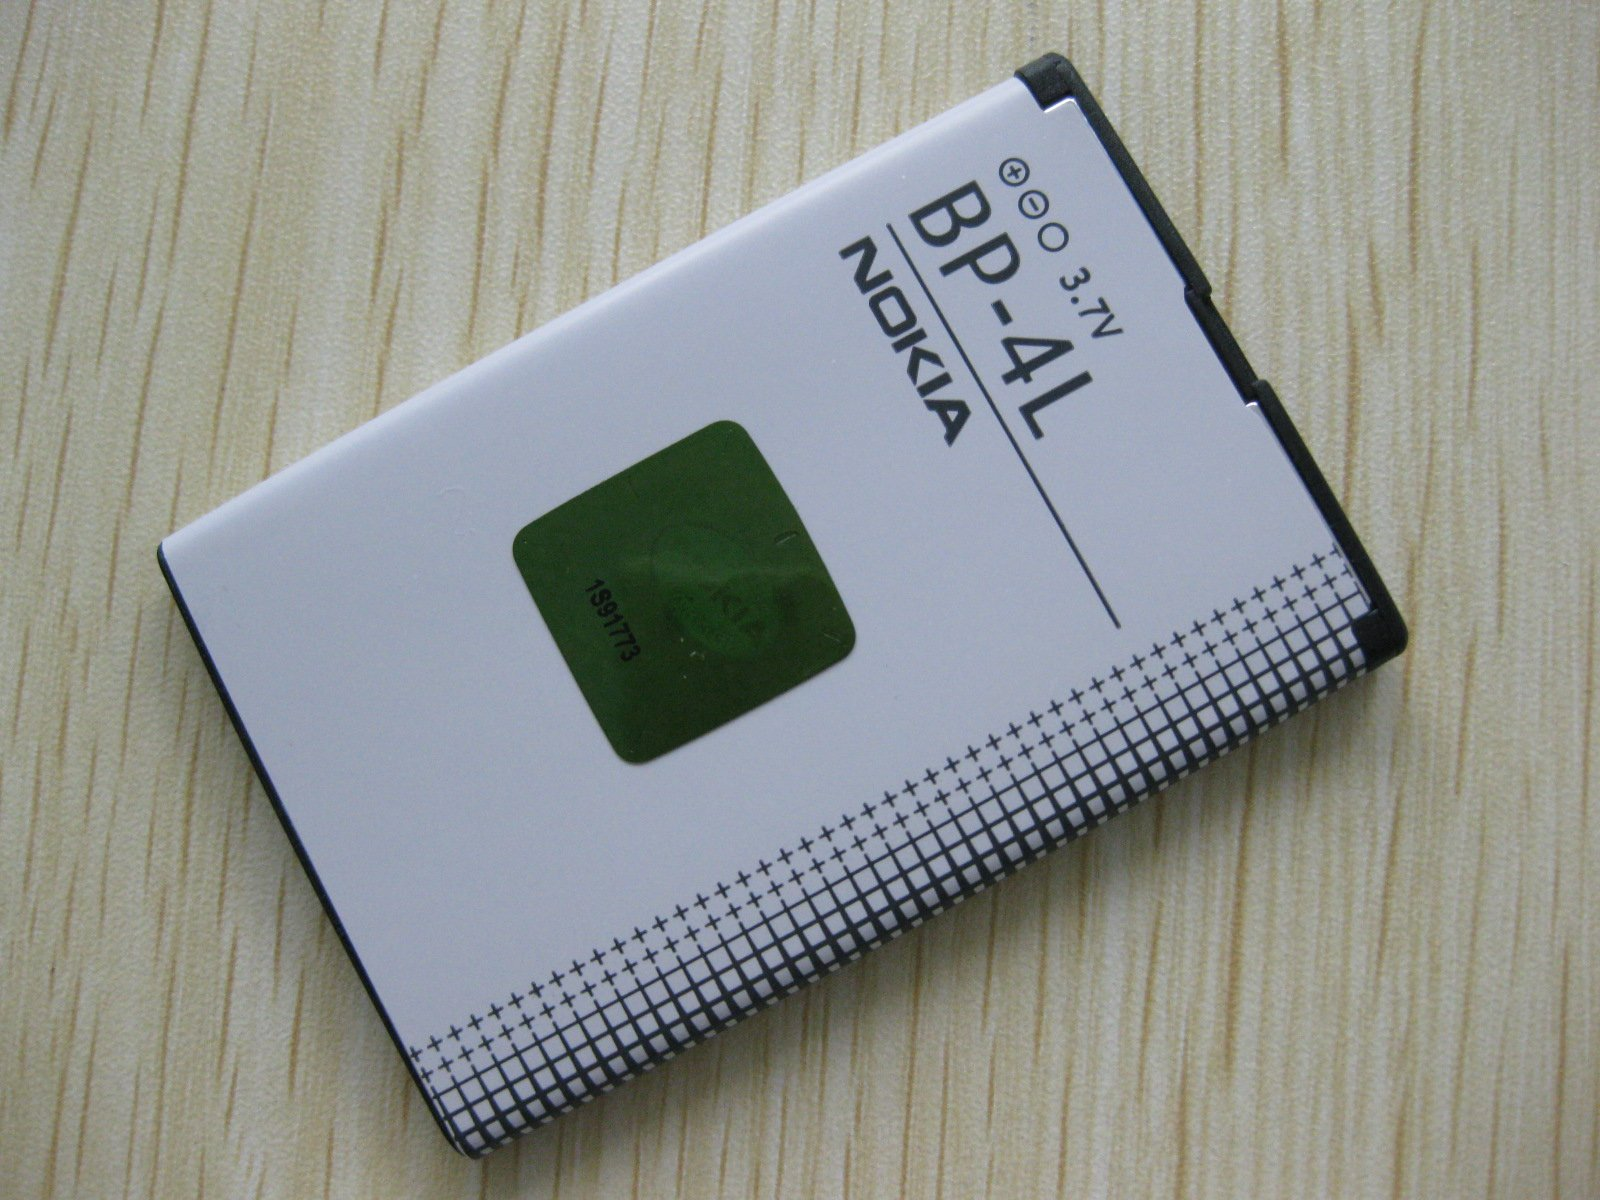 display 2 buzzer 3 vibratory 4 sim connector 5 sim holder 6 key pad